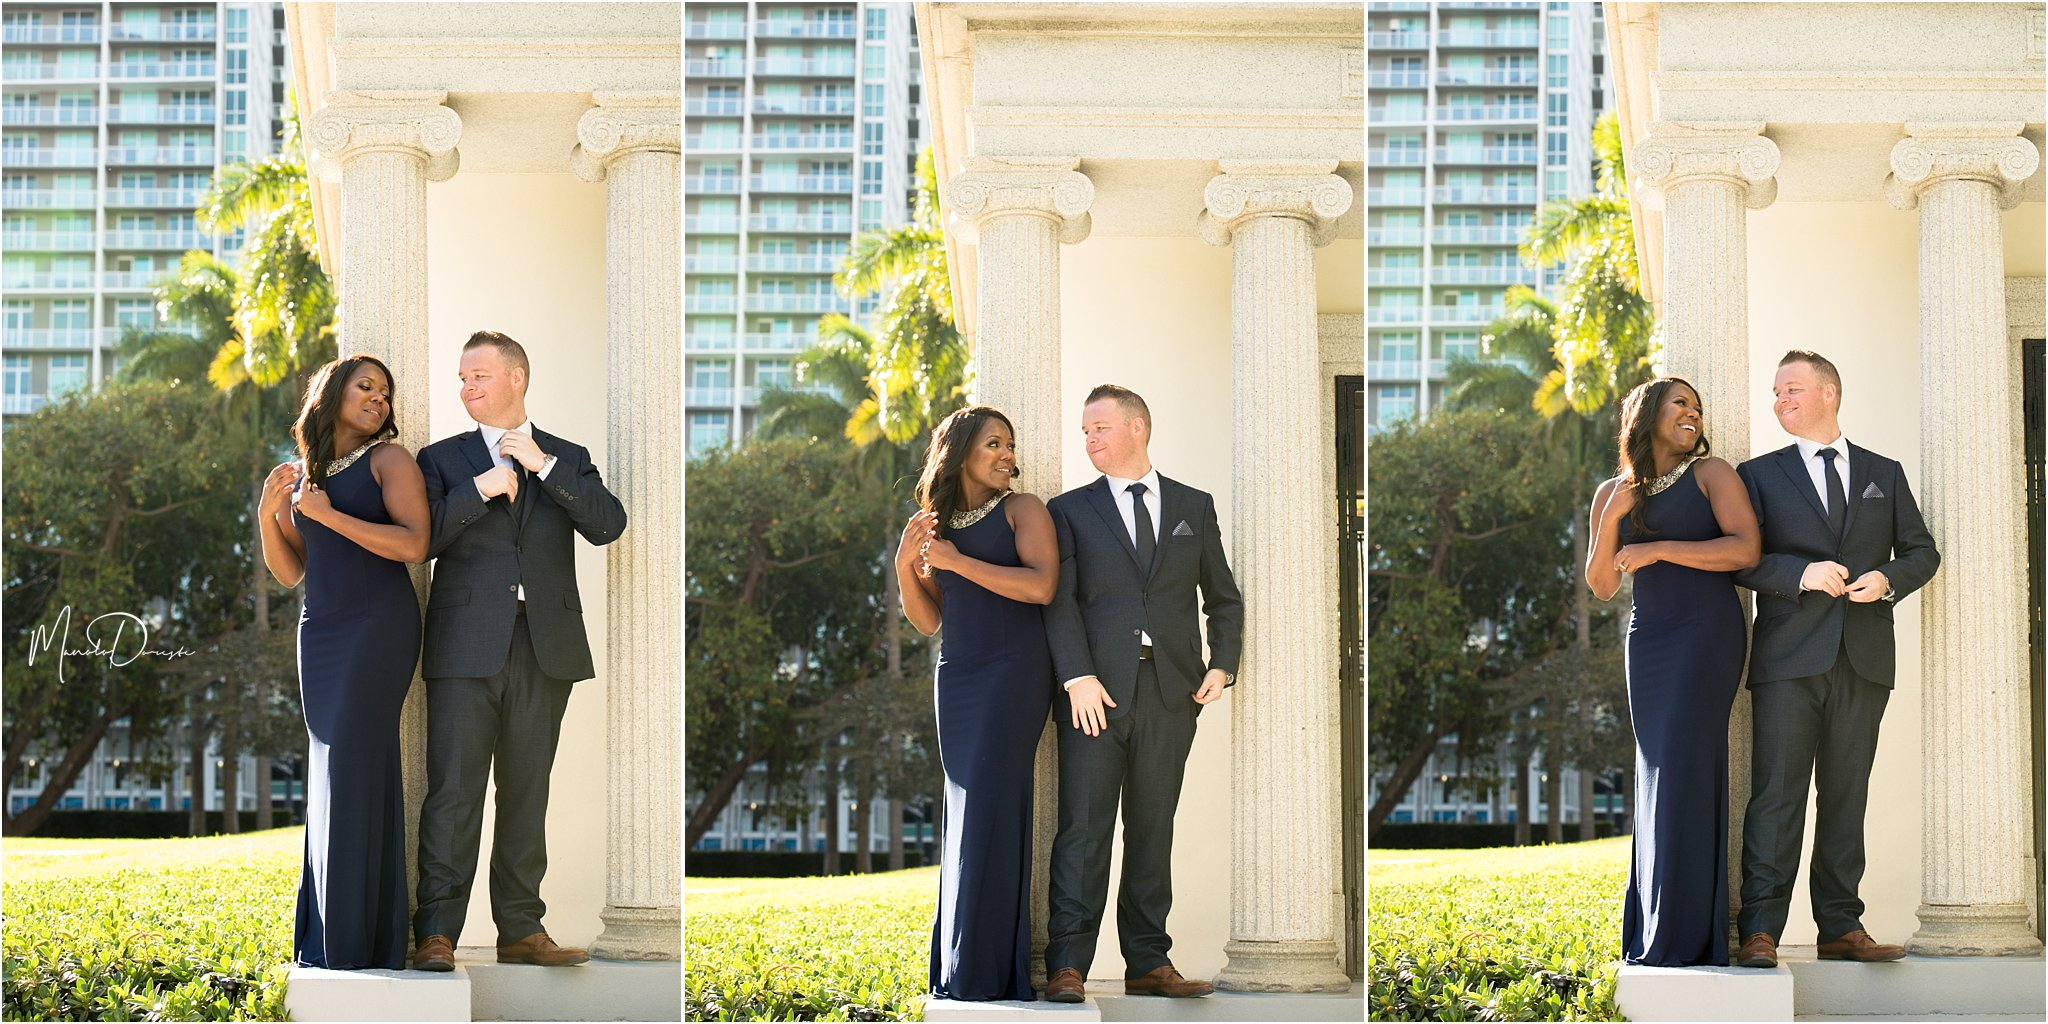 0704_ManoloDoreste_InFocusStudios_Wedding_Family_Photography_Miami_MiamiPhotographer.jpg